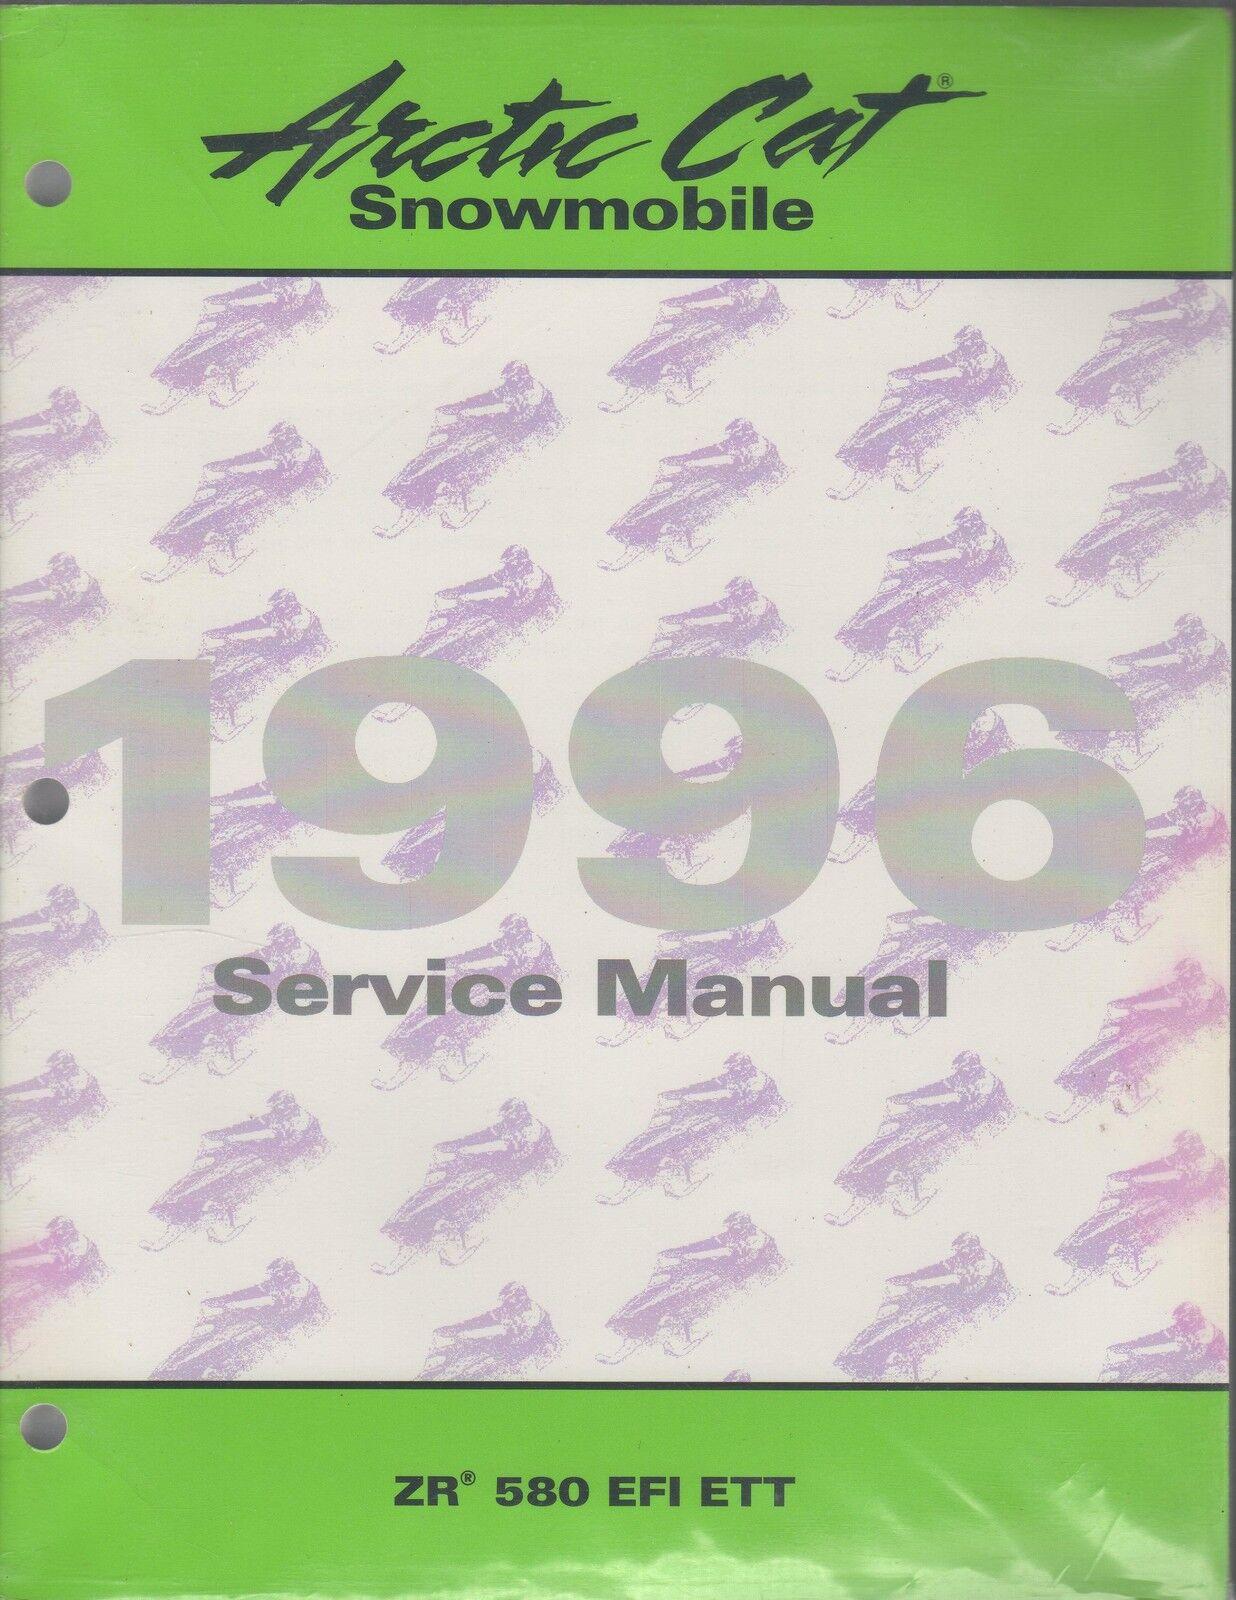 1996  ARCTIC CAT SNOWMOBILE ZR 580 EFI ETT SERVICE MANUAL PN 2255-438